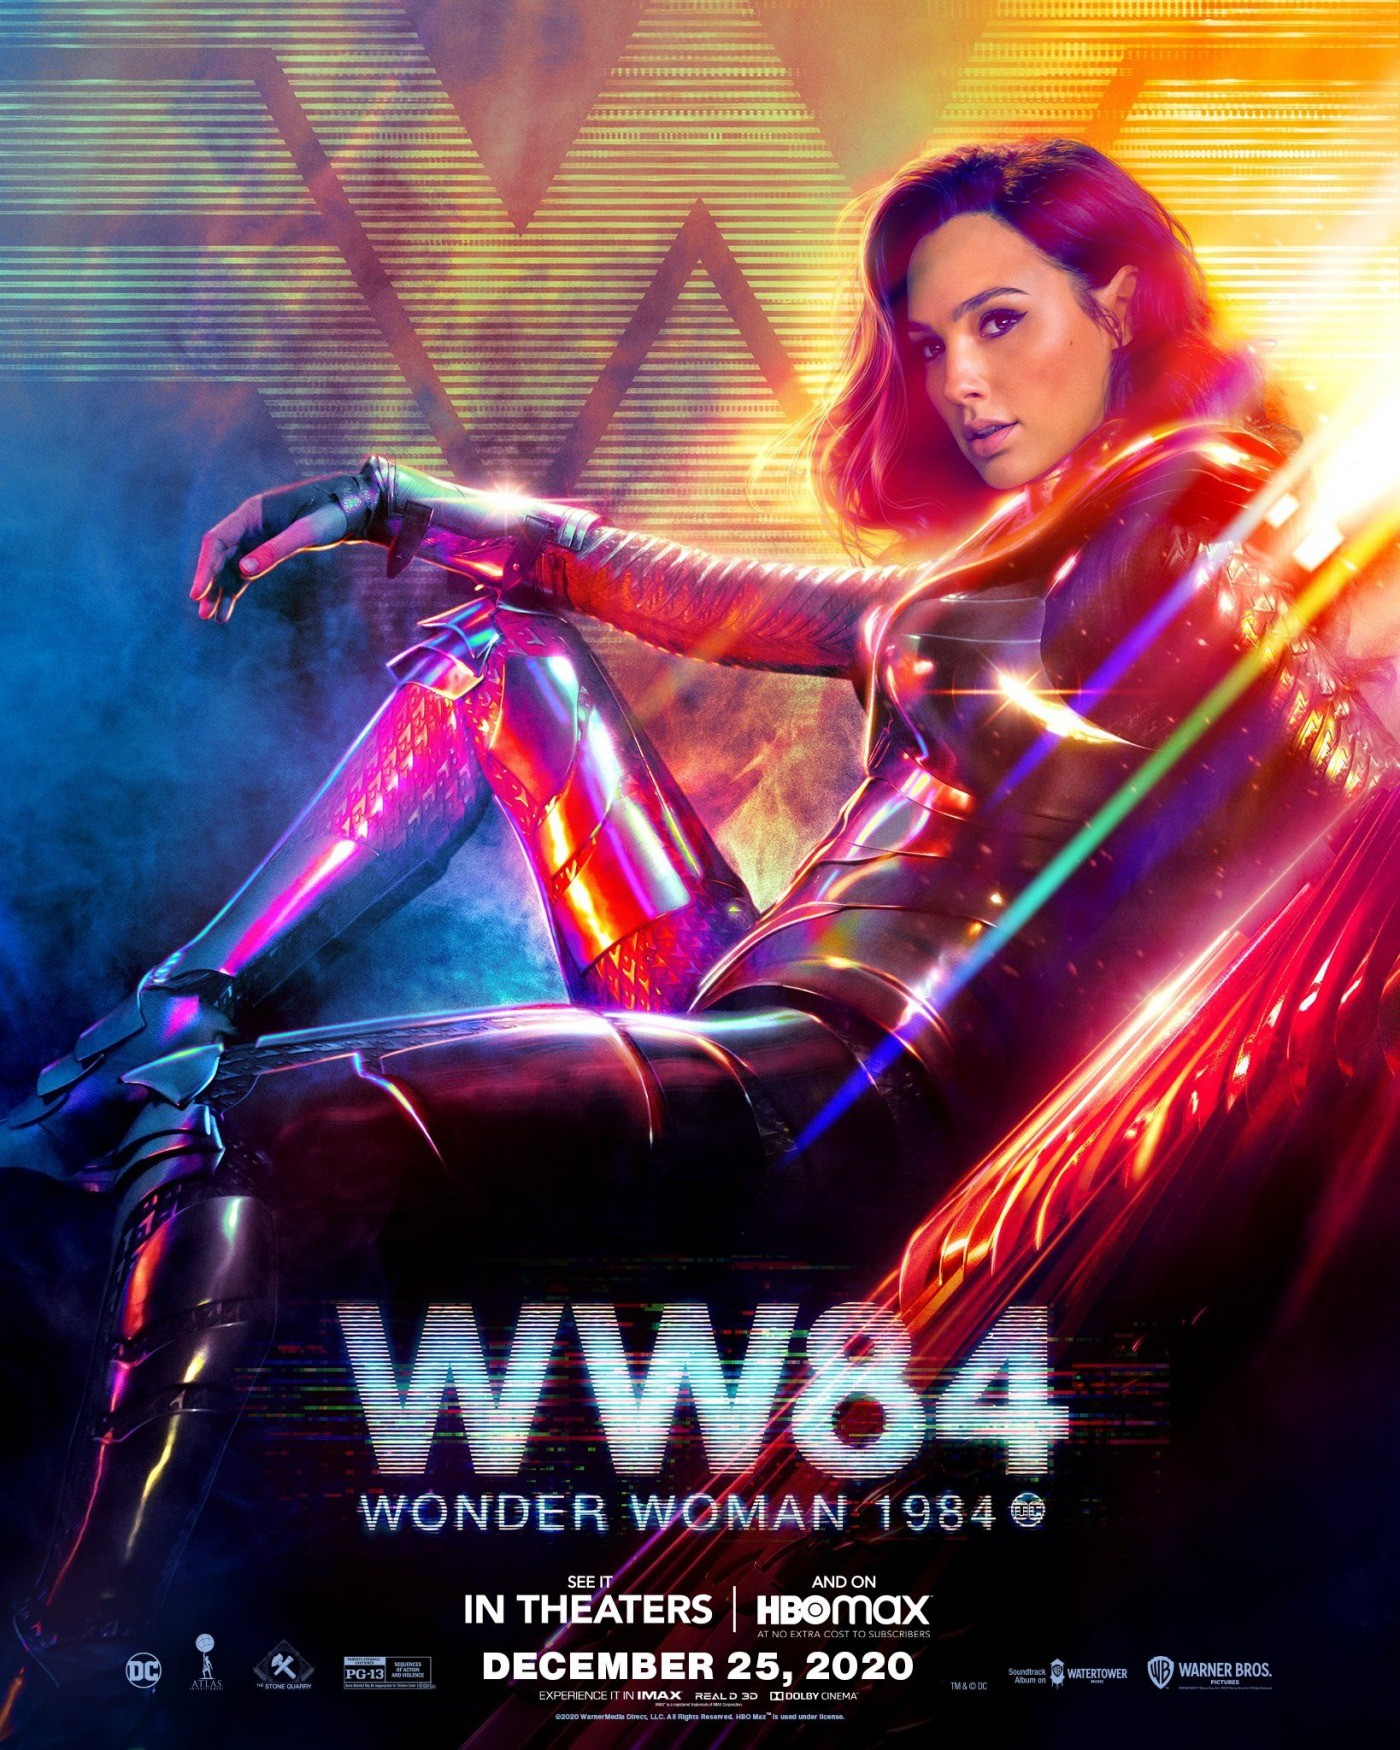 wonder-woman-1984-imax-poster-05